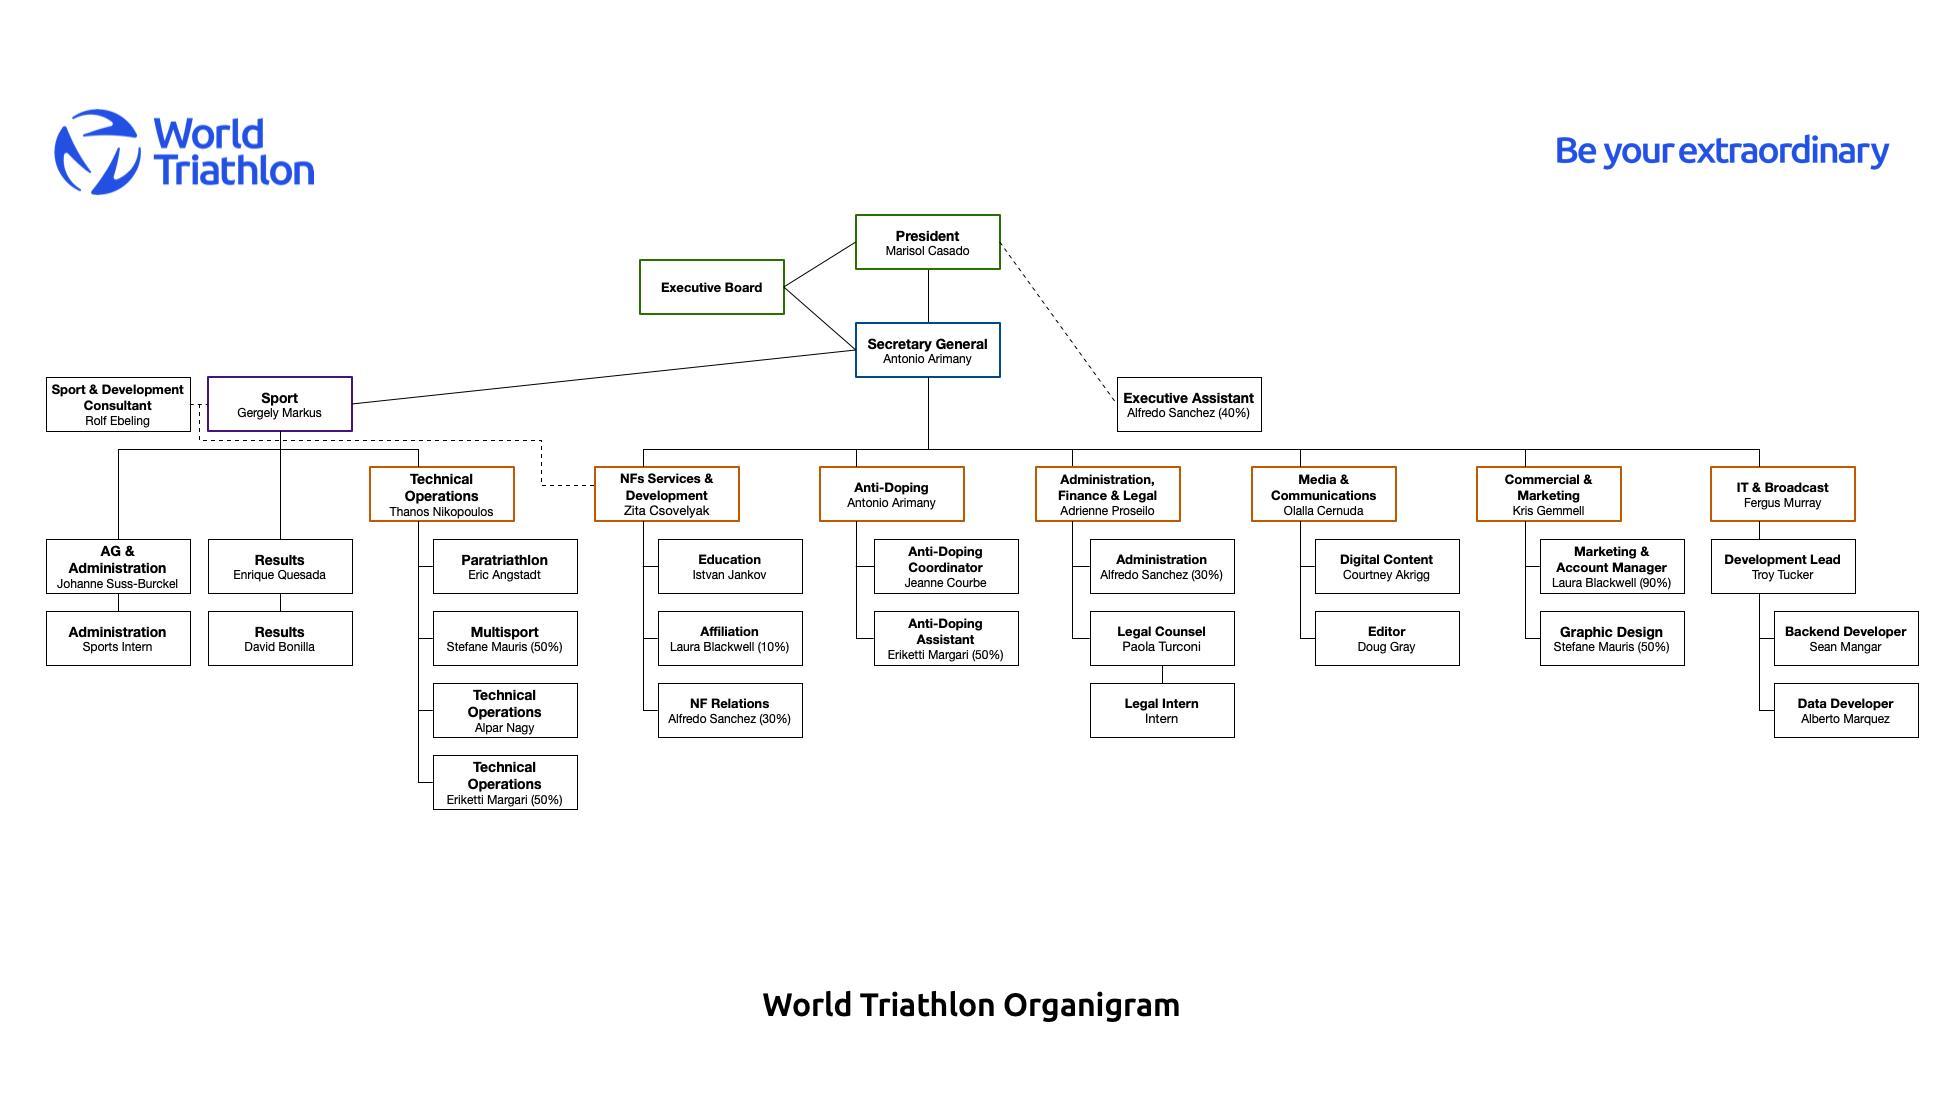 World Triathlon Organigram